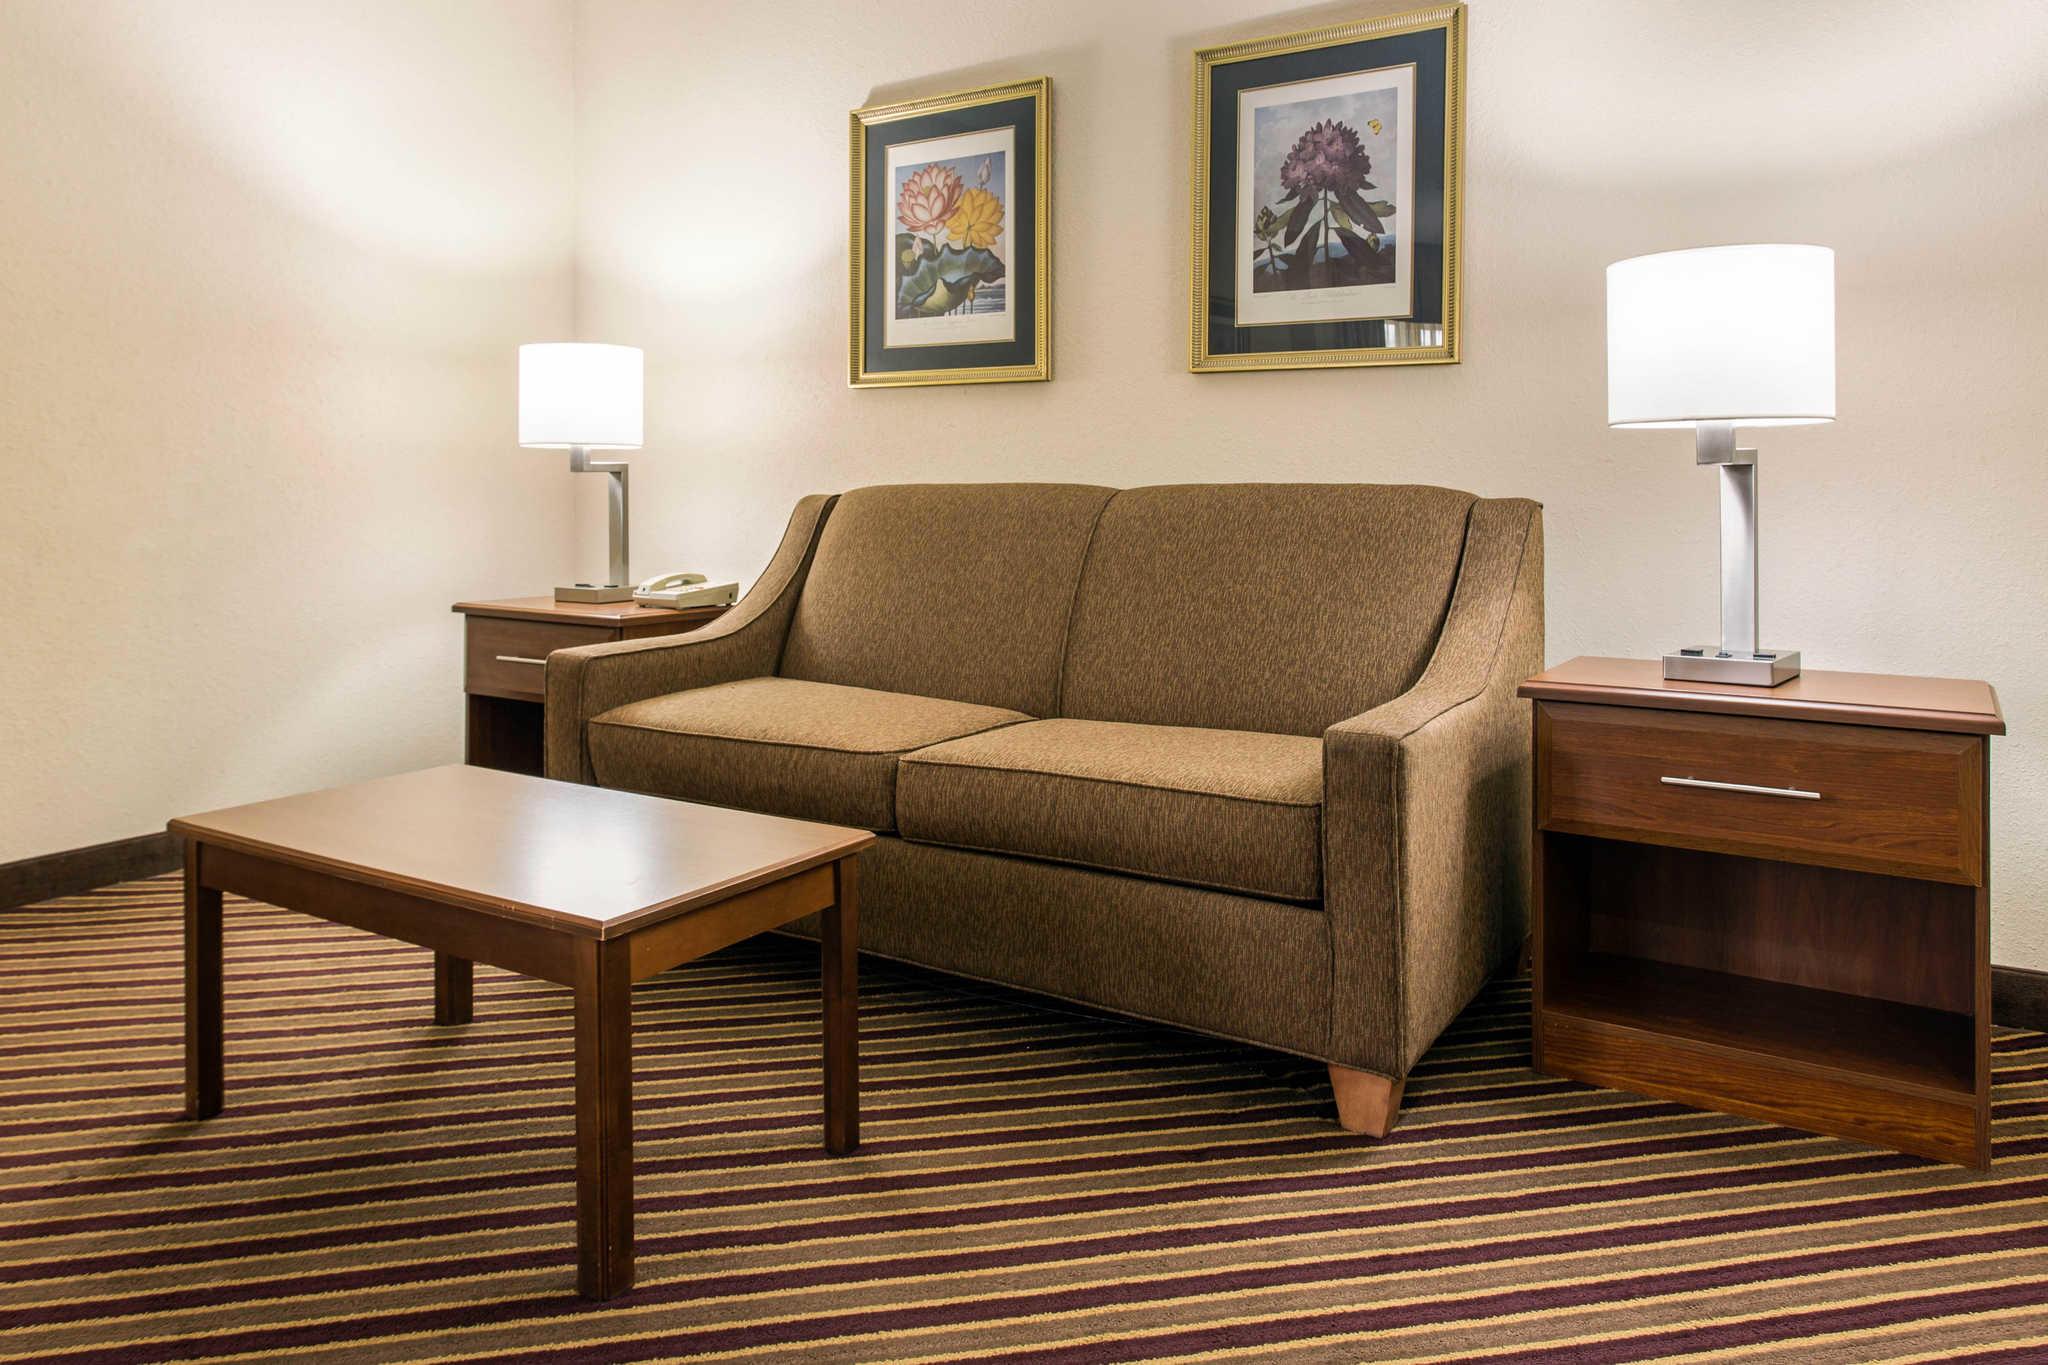 Comfort Inn & Suites Crabtree Valley image 17